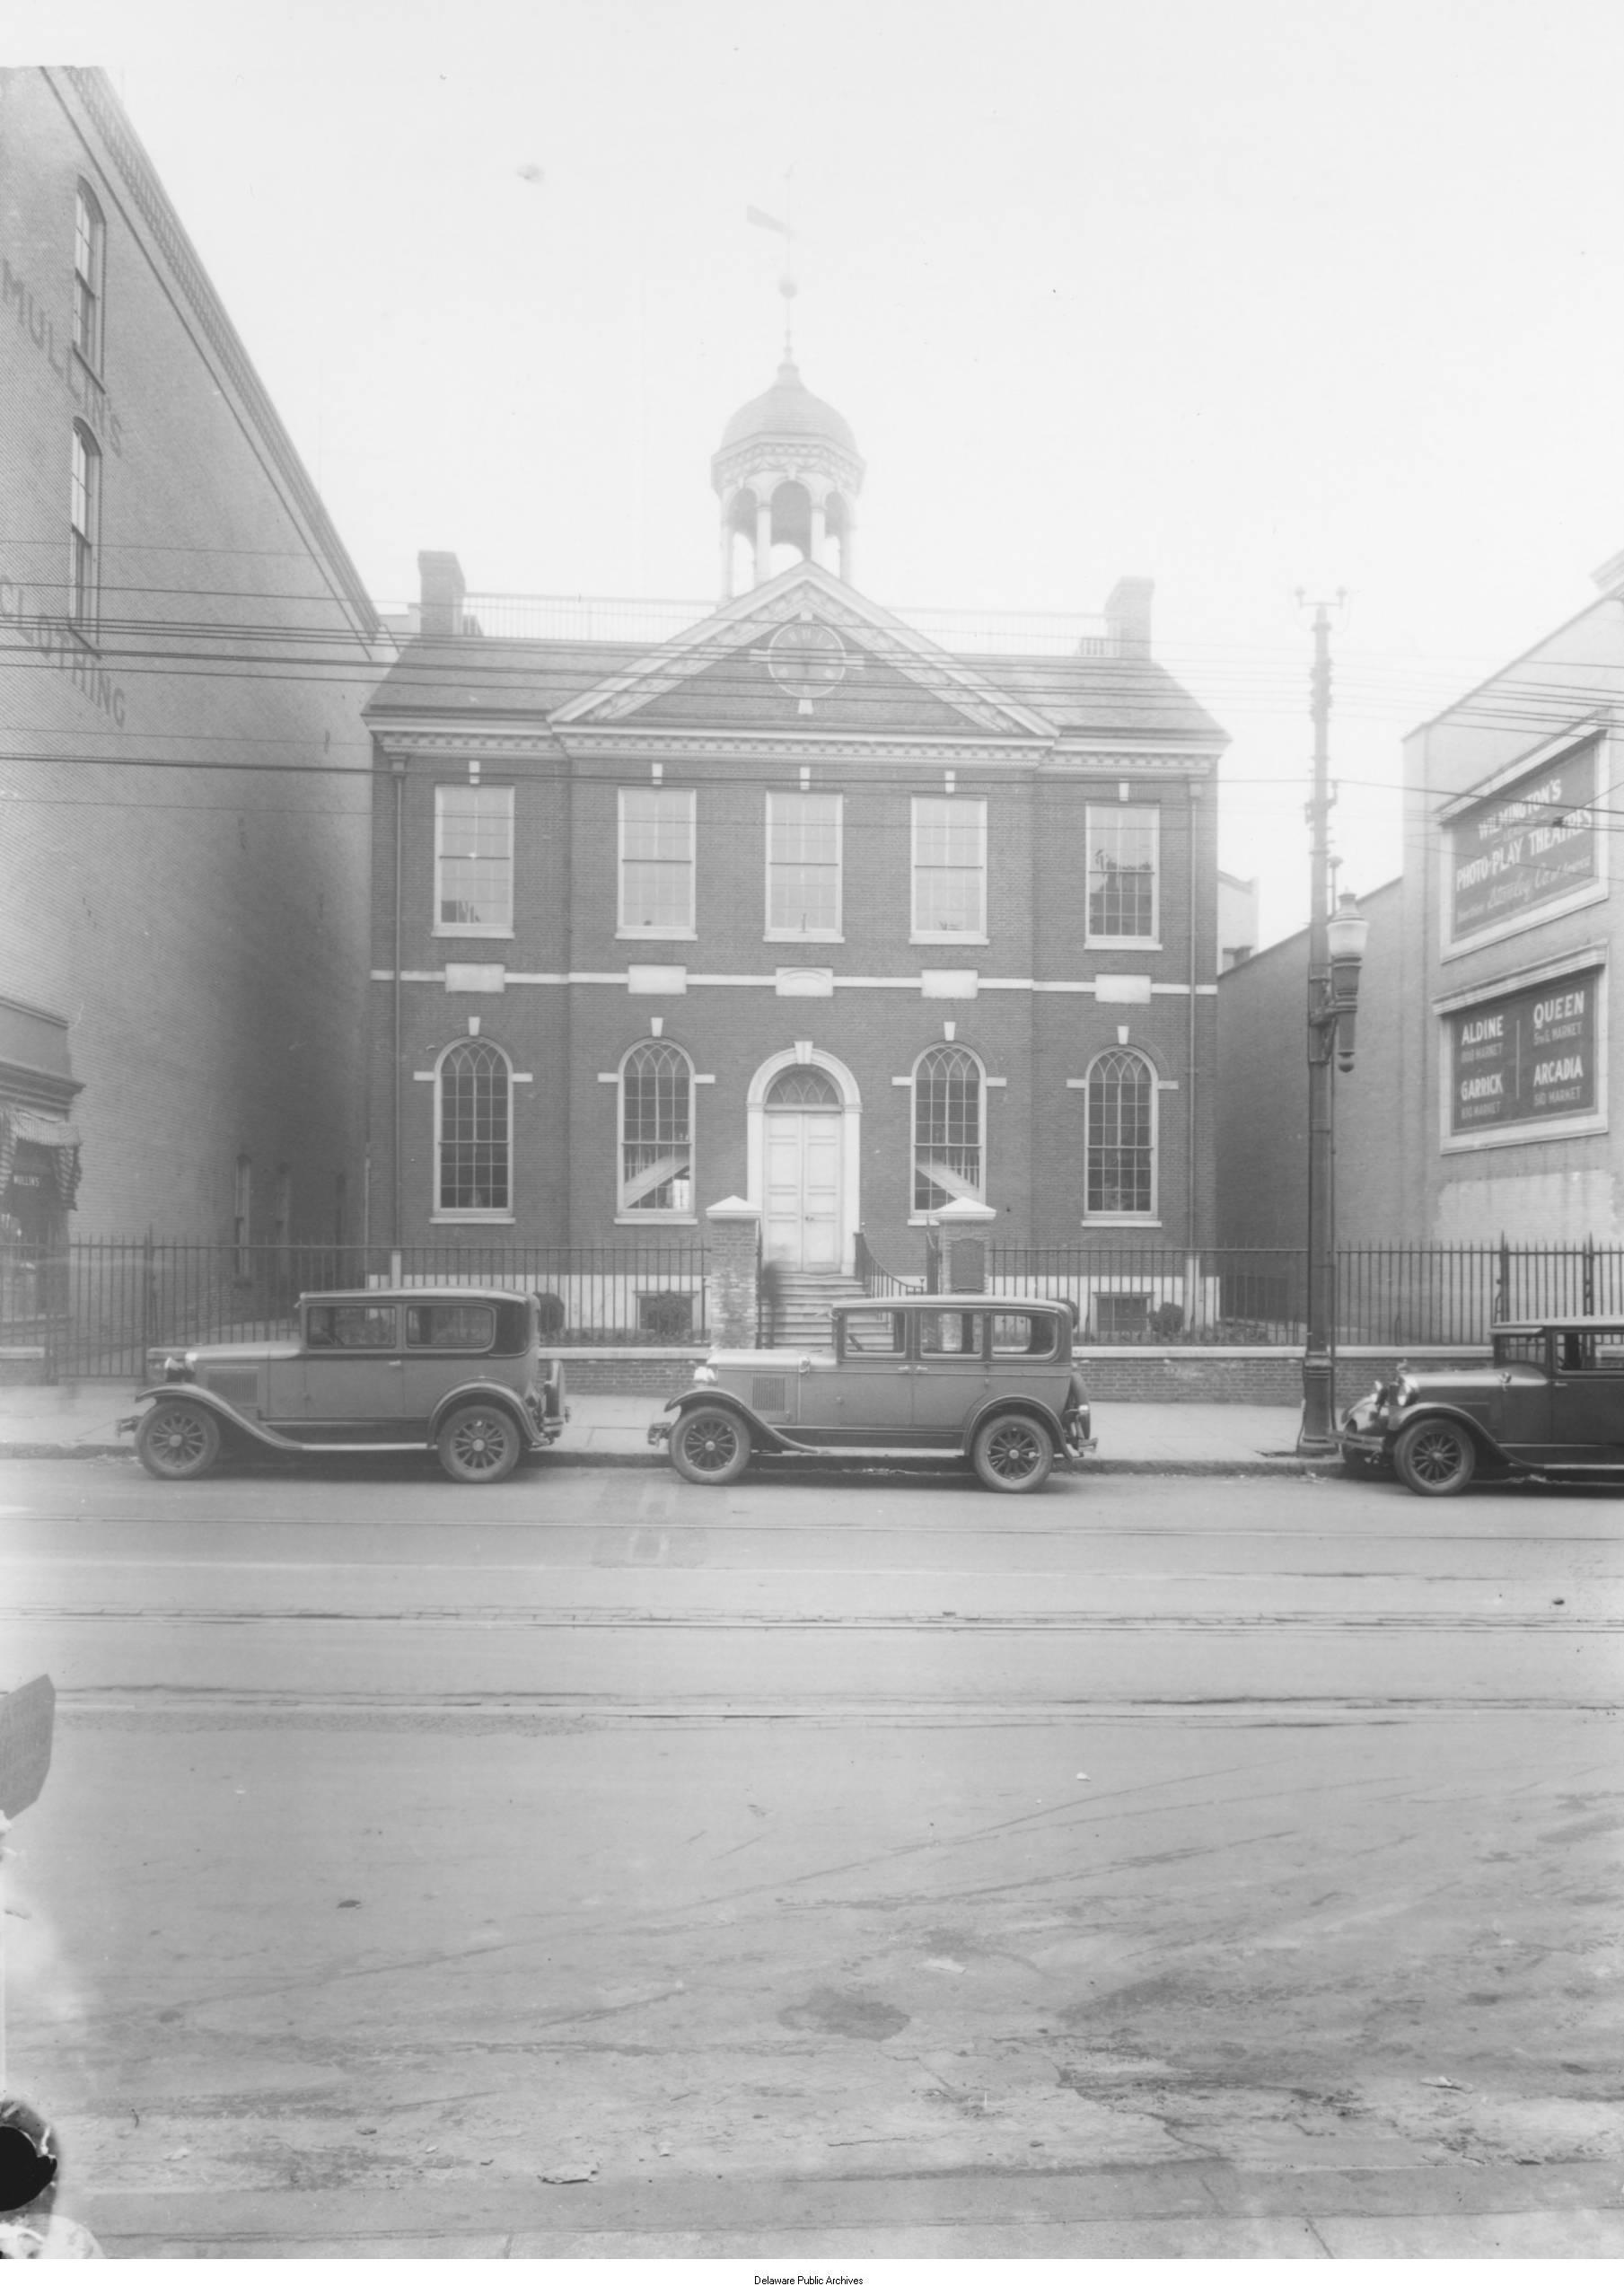 1927 Photo of Old Town Hall in Wilmington, DE.